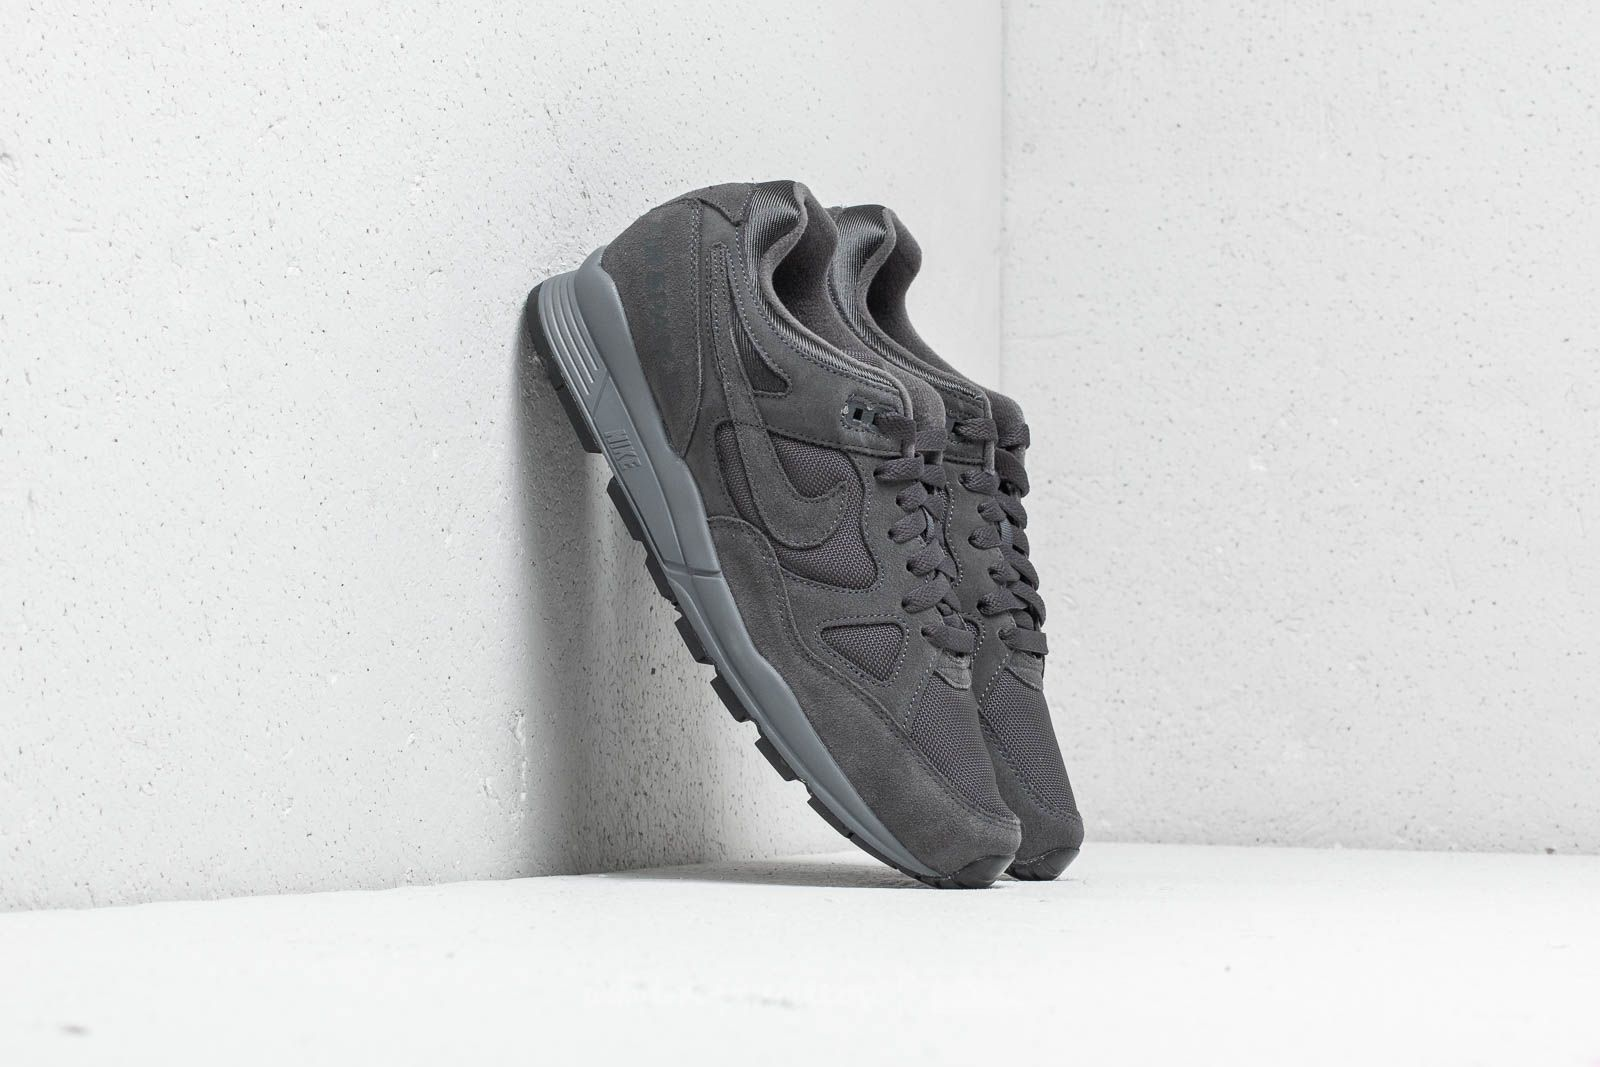 Nike Air Span II Premium Anthracite/ Anthracite | Footshop